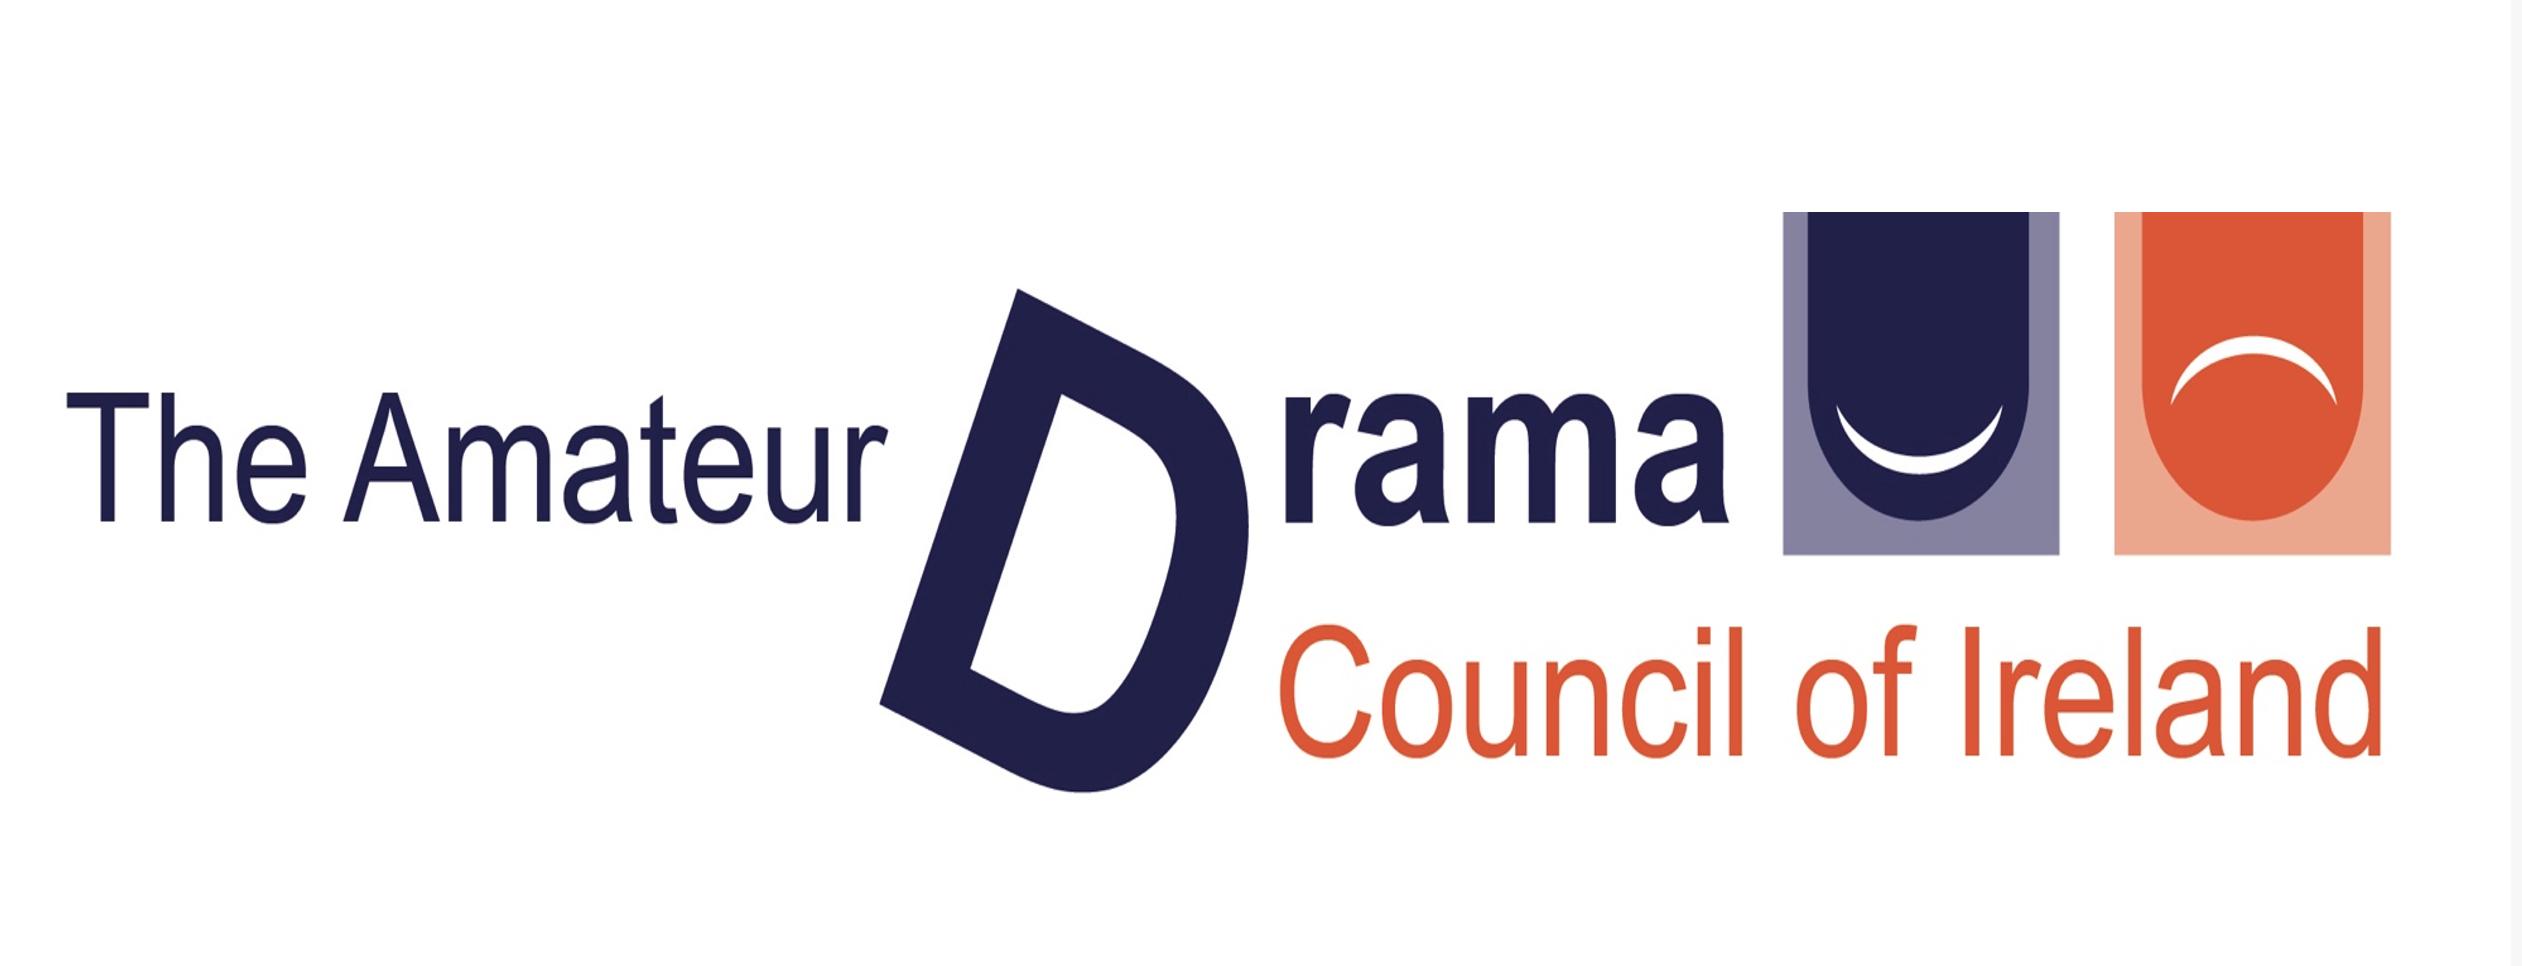 Amateur Drama Council of Ireland